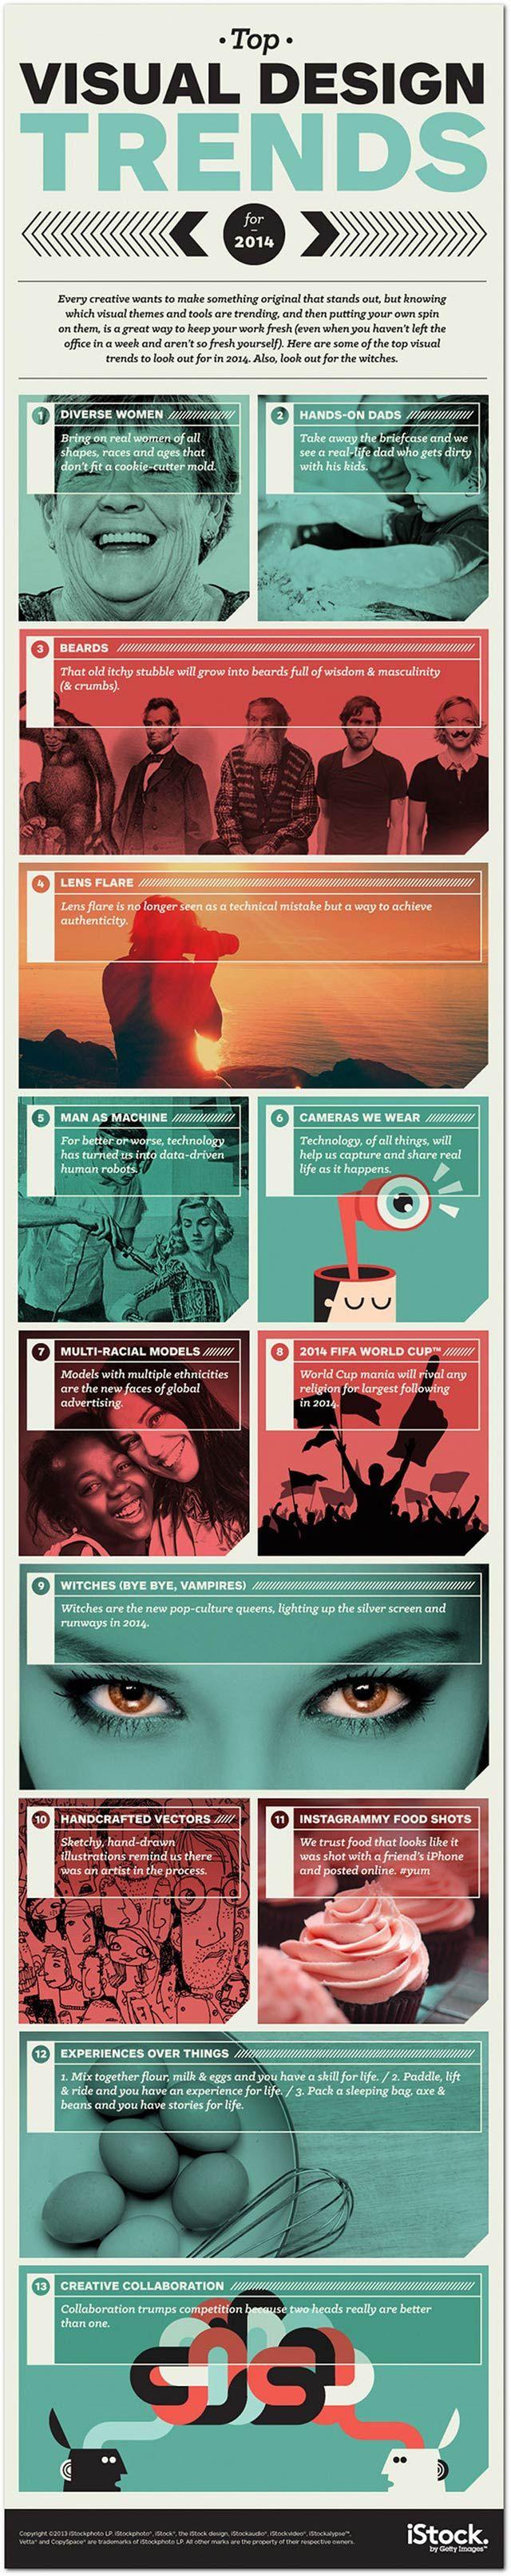 Mejores 13 imágenes de infografia en Pinterest | Diseño gráfico ...